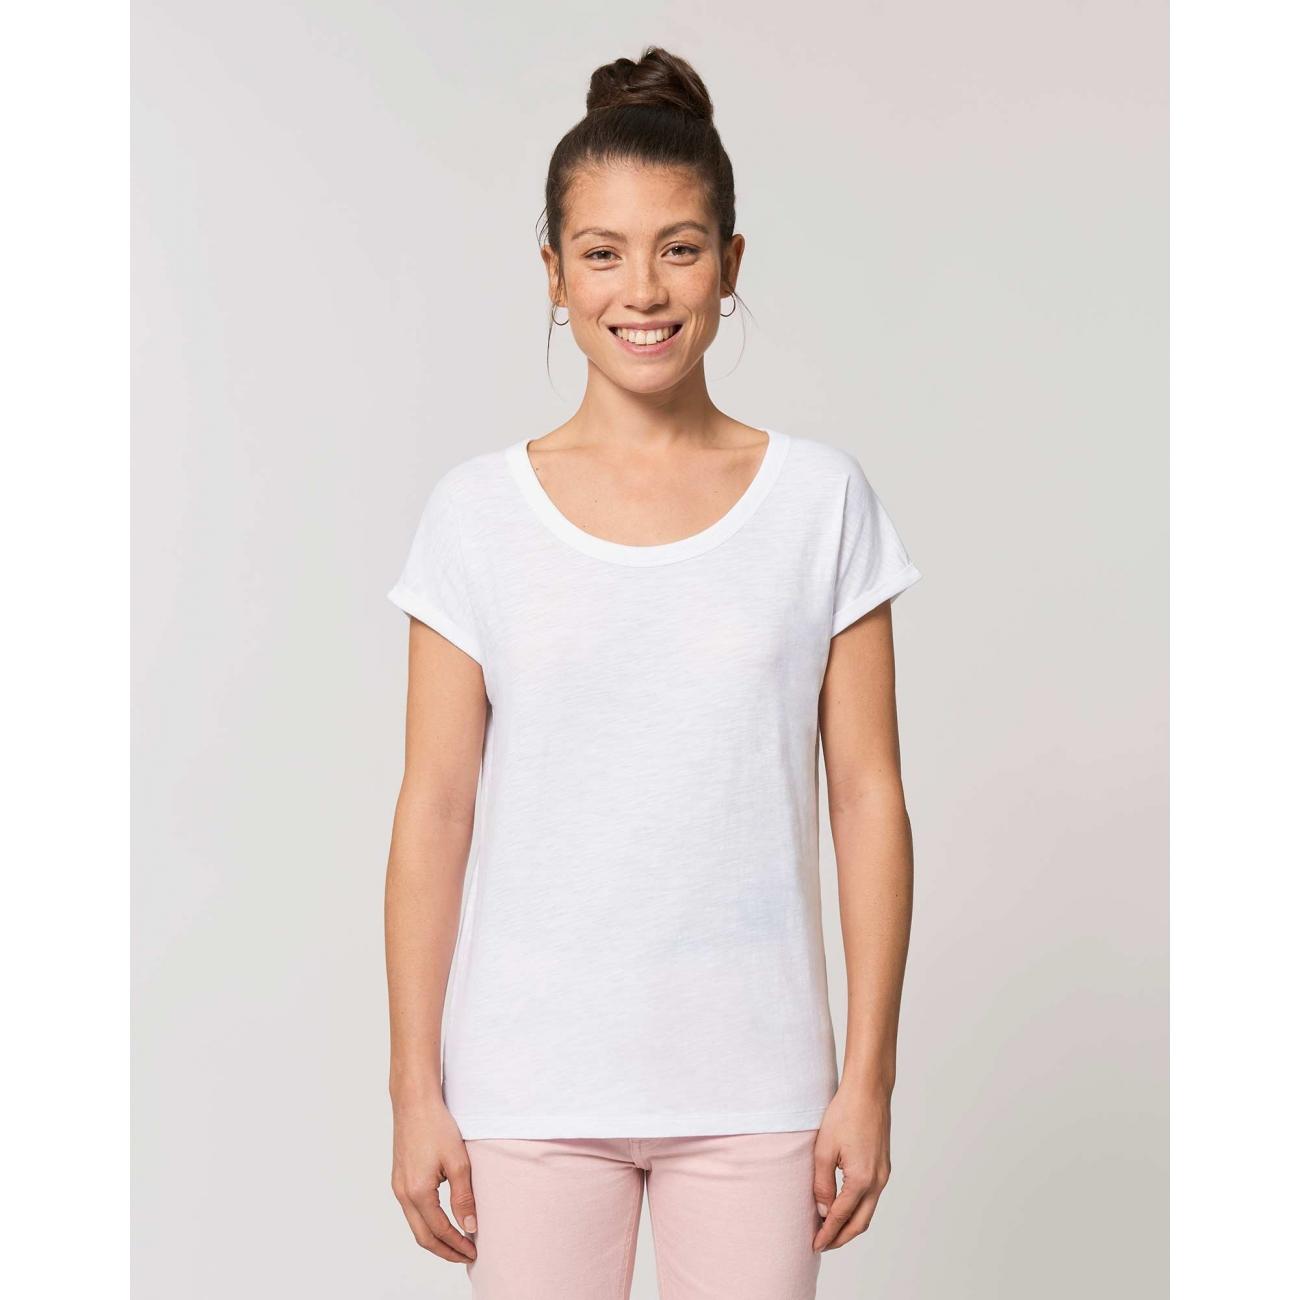 https://tee-shirt-bio.com/9299-thickbox_default/tee-shirt-femme-blanc-manches-repliees-coton-bio-fwf.jpg